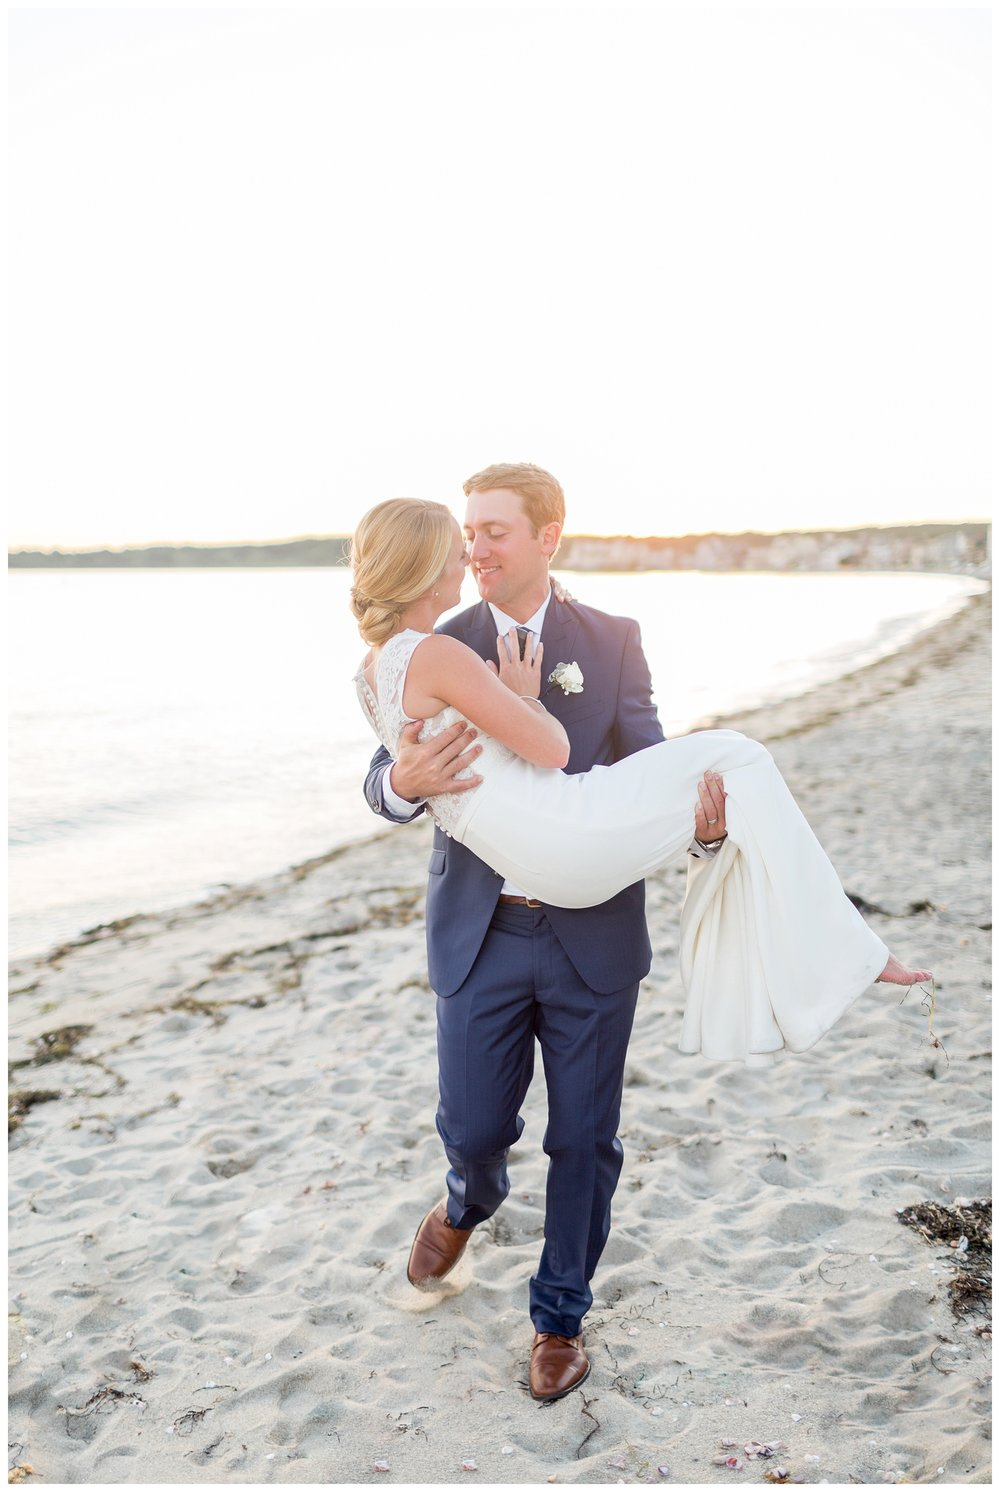 Abby_Johnston_Wedding_0101.jpg